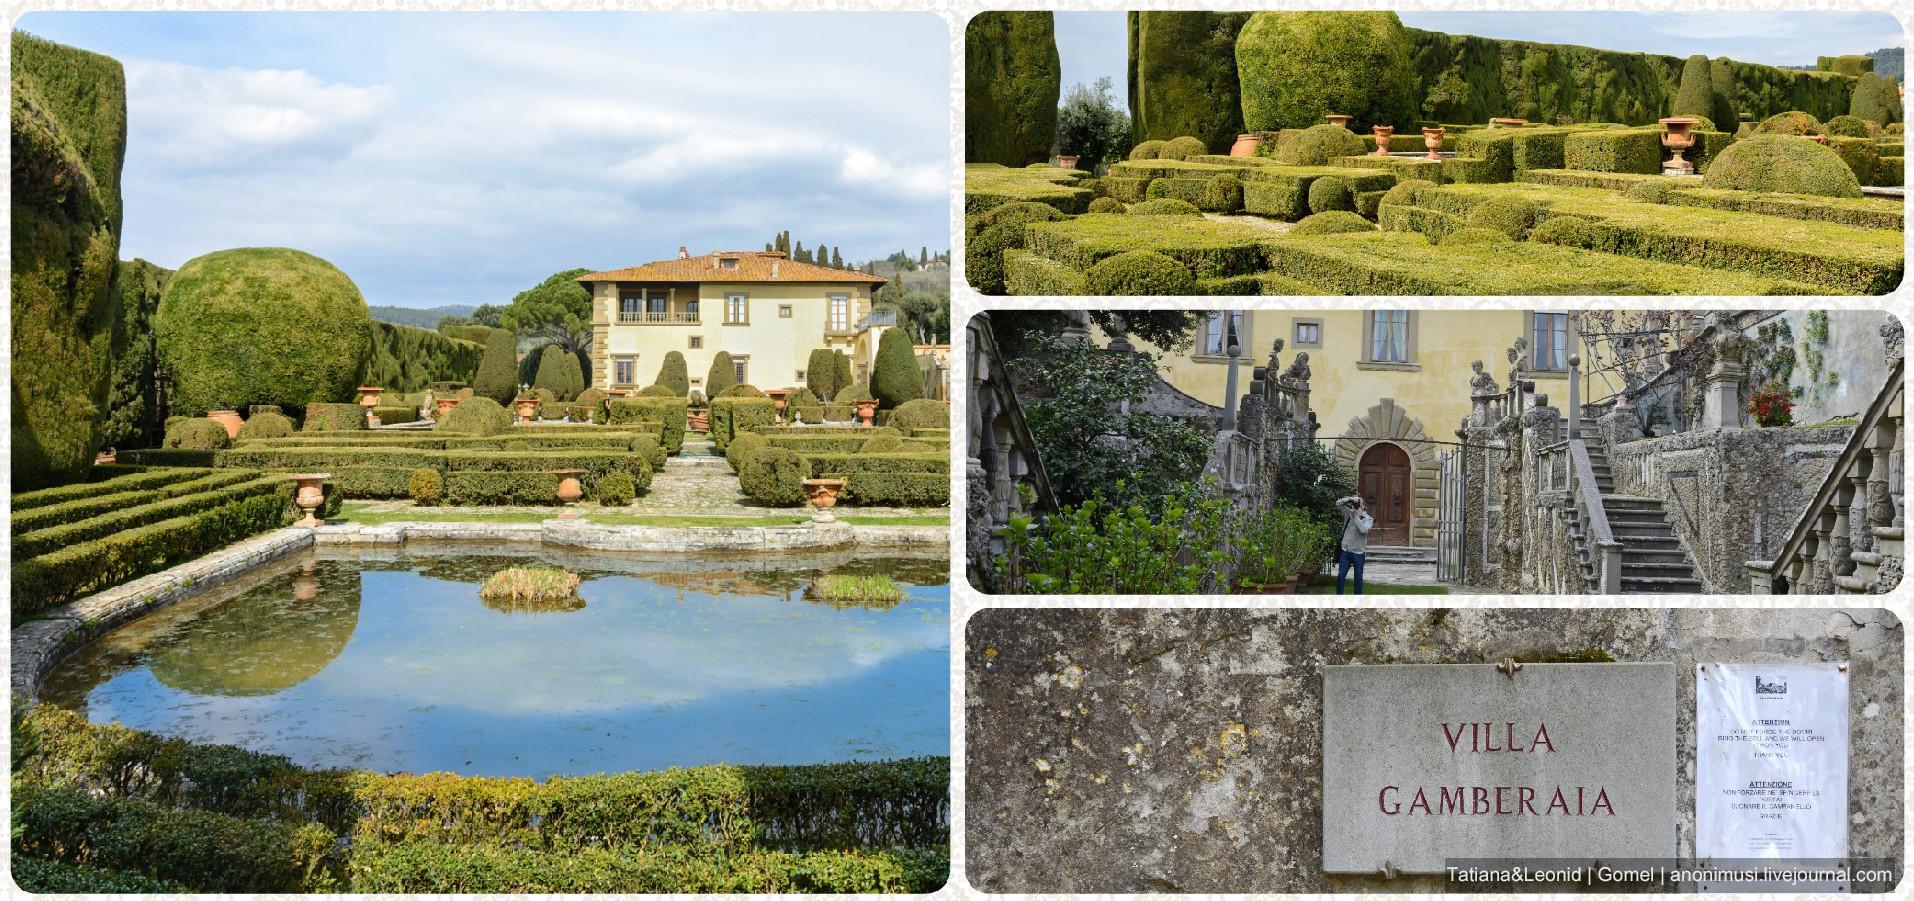 Вилла Гамберайя (Villa Gamberaia). Италия. Сеттиньяно